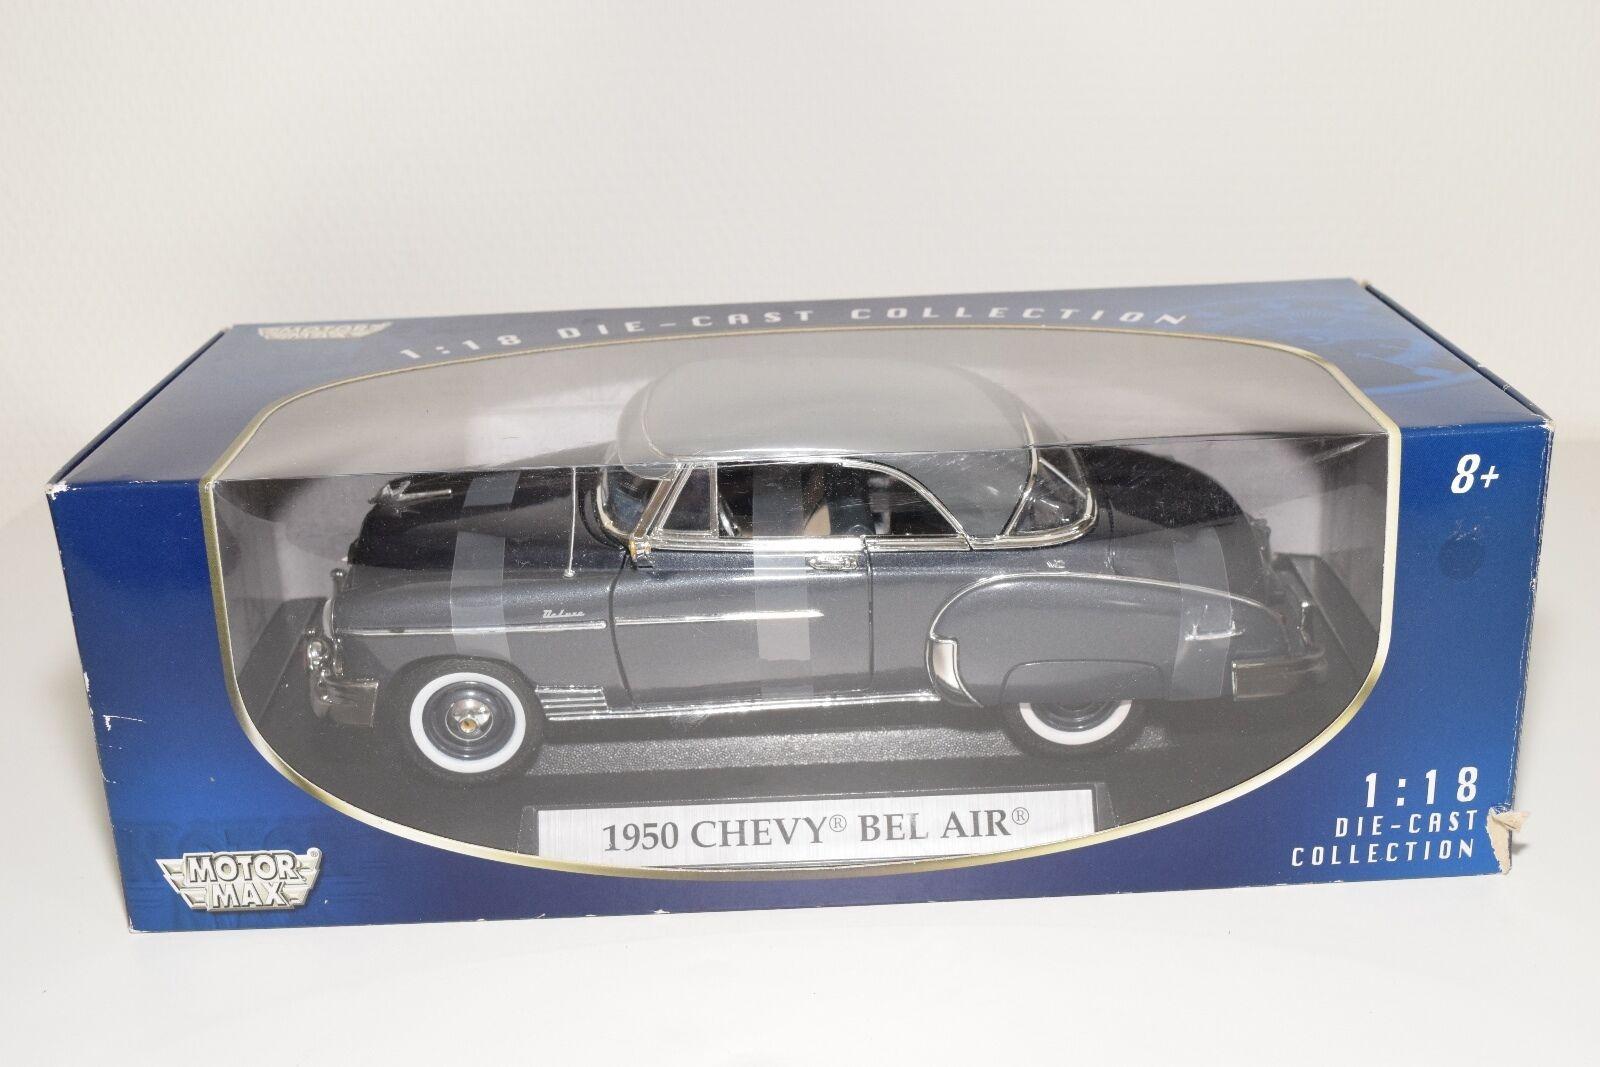 MOTOR MAX MOTORMAX CHEVY CHEVROLET BEL AIR 1950 MET. grigio MINT scatolaED RARE